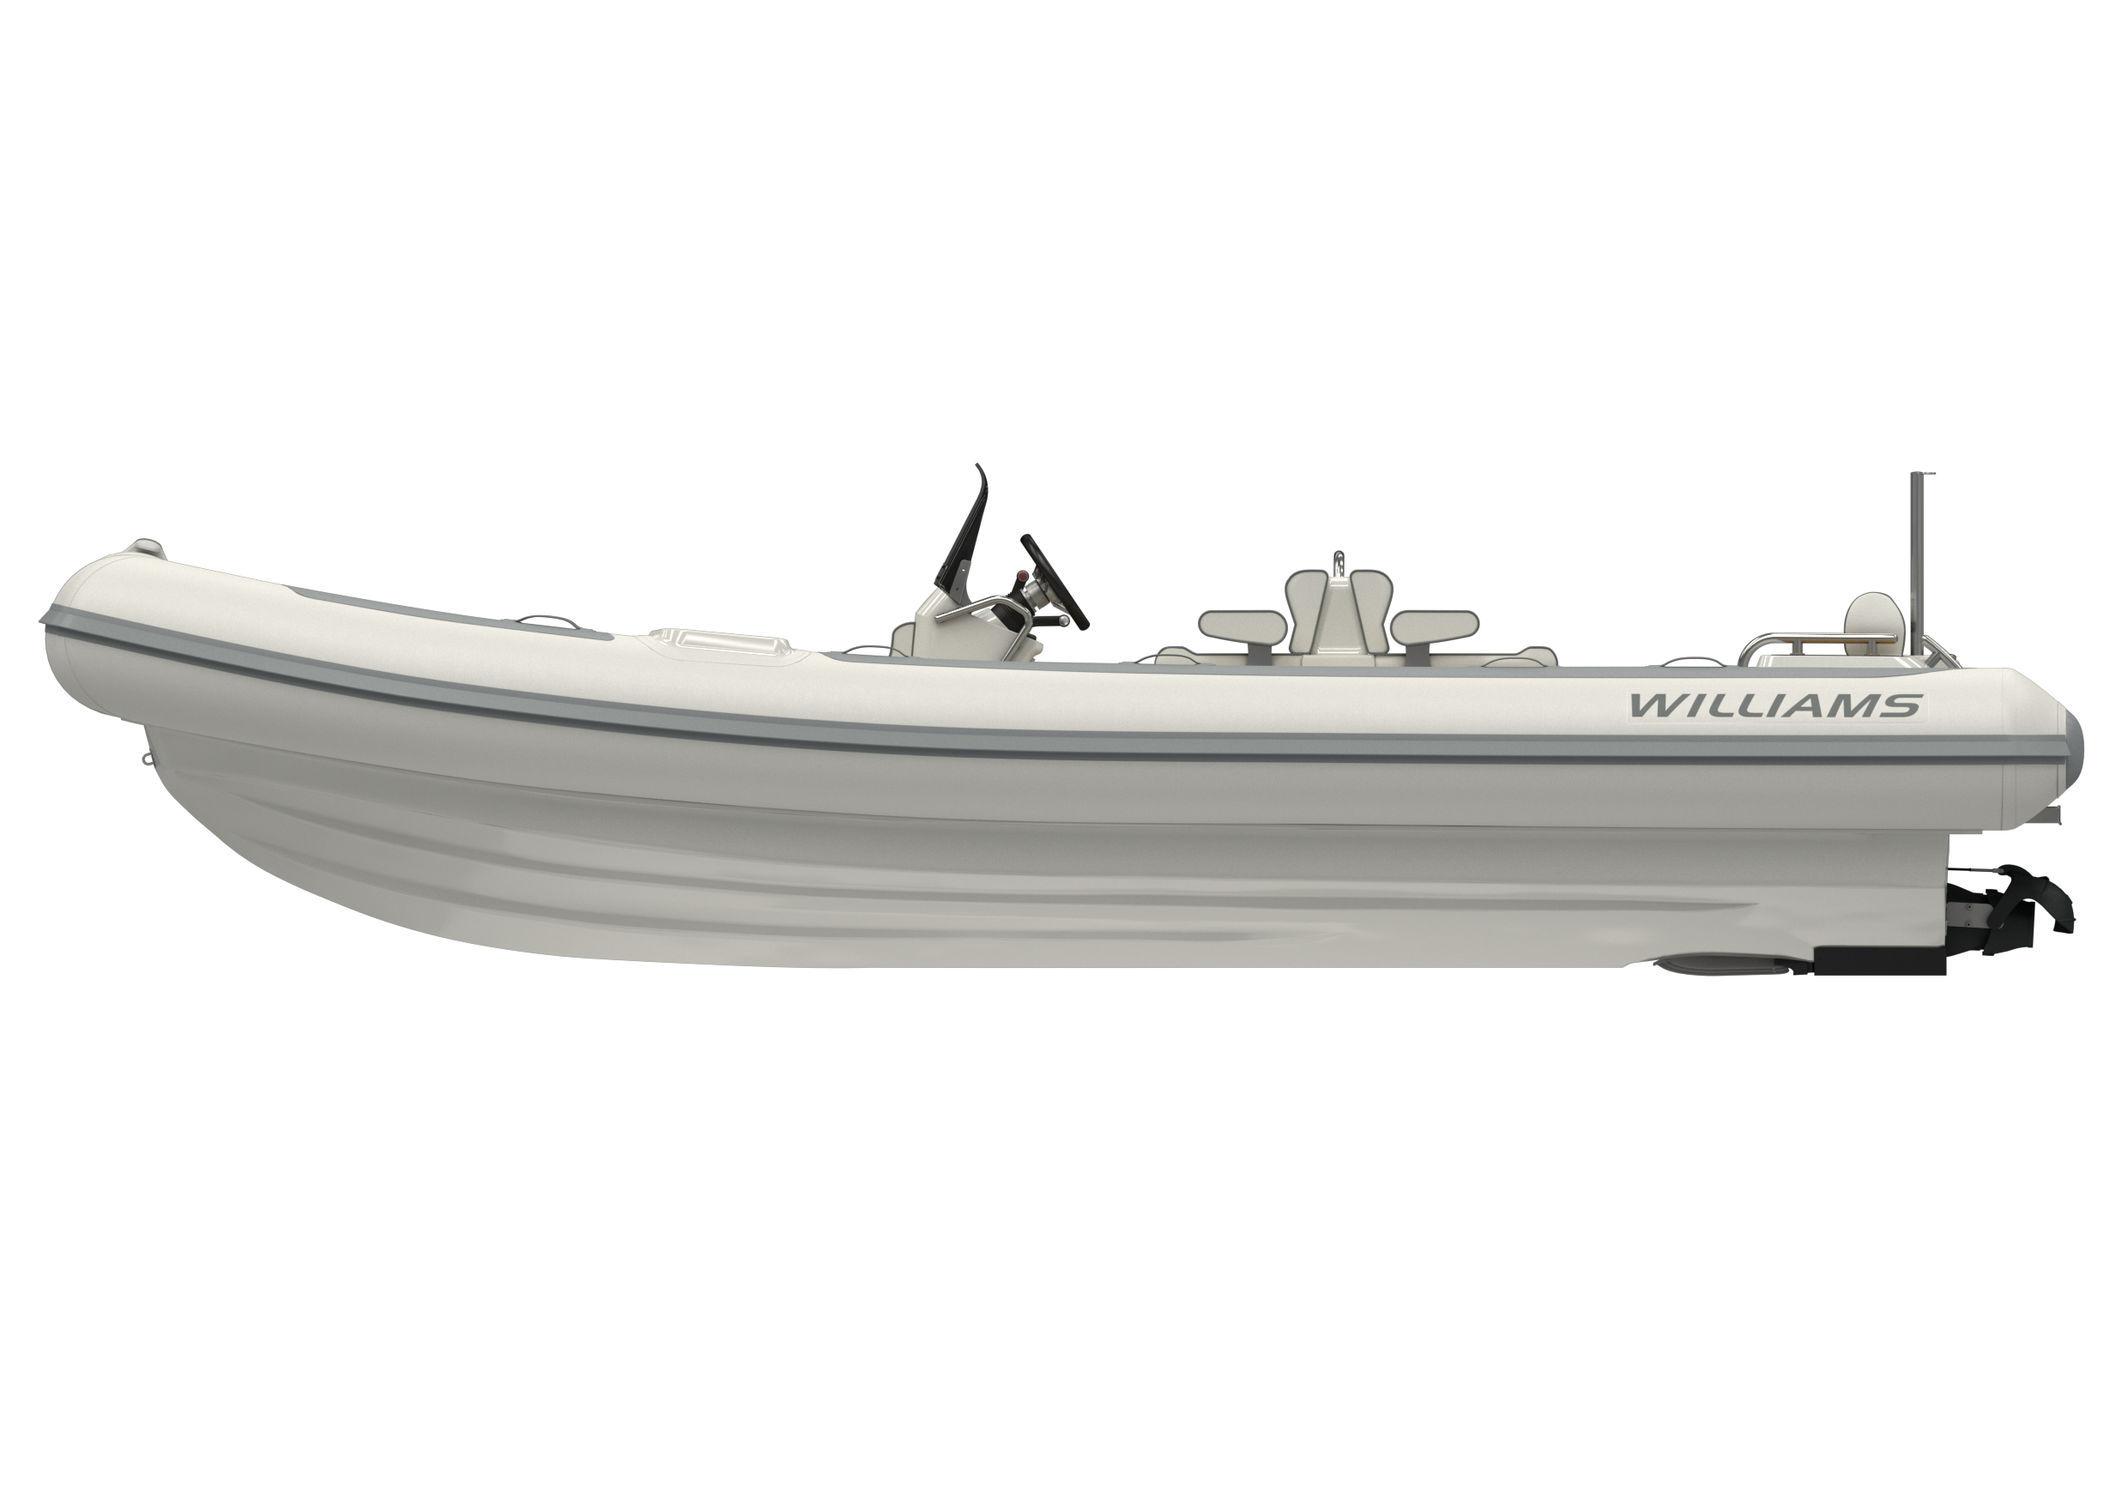 Hydro-jet inflatable boat - DIESELJET 625 - Williams Performance Tenders - diesel / rigid / center console